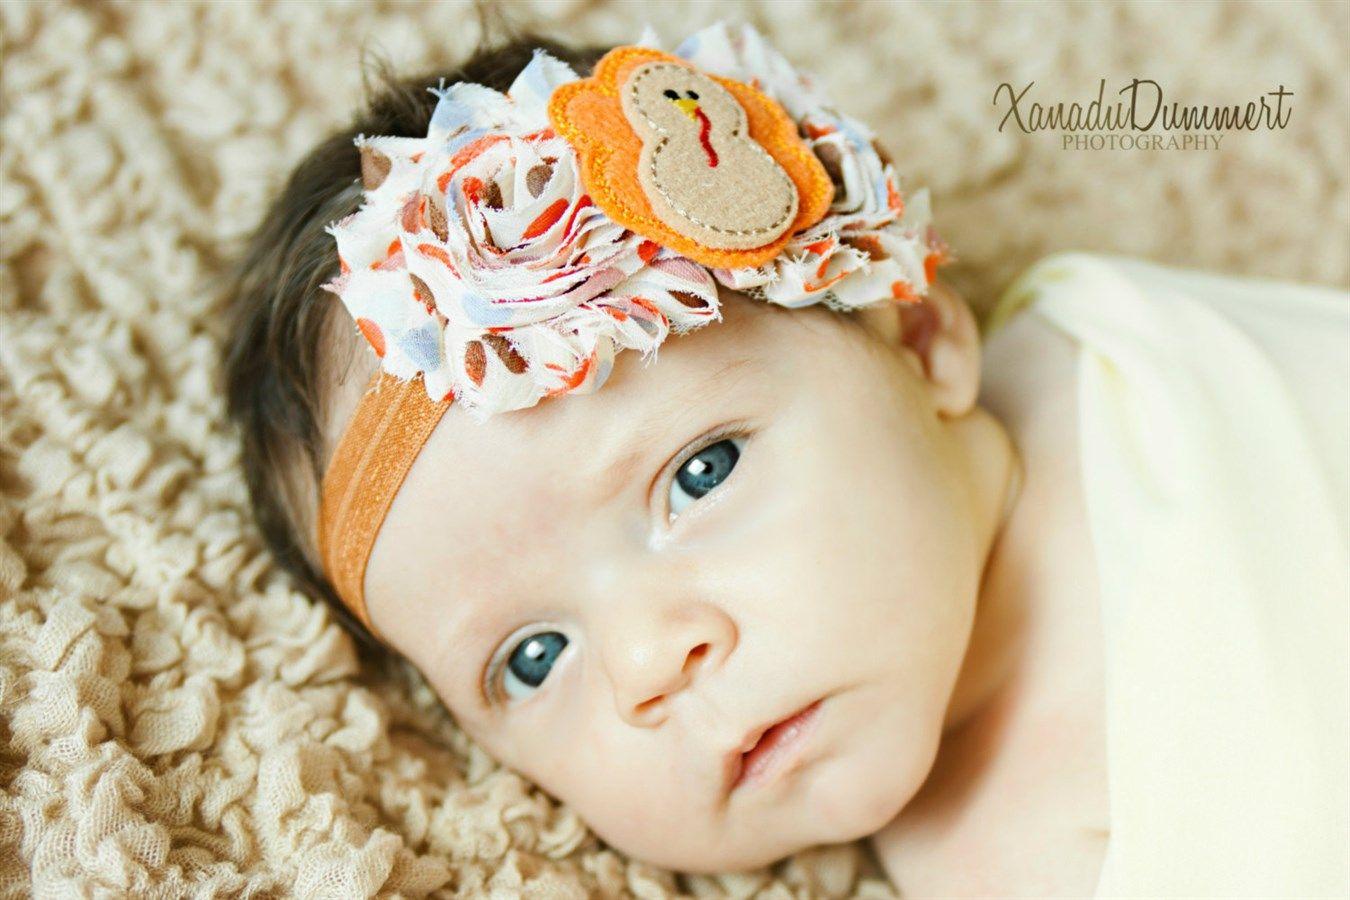 Little baby headbands thanksgiving headbands toddler headbands felt headbands newborn headbands thanksgiving hair bows baby headbands